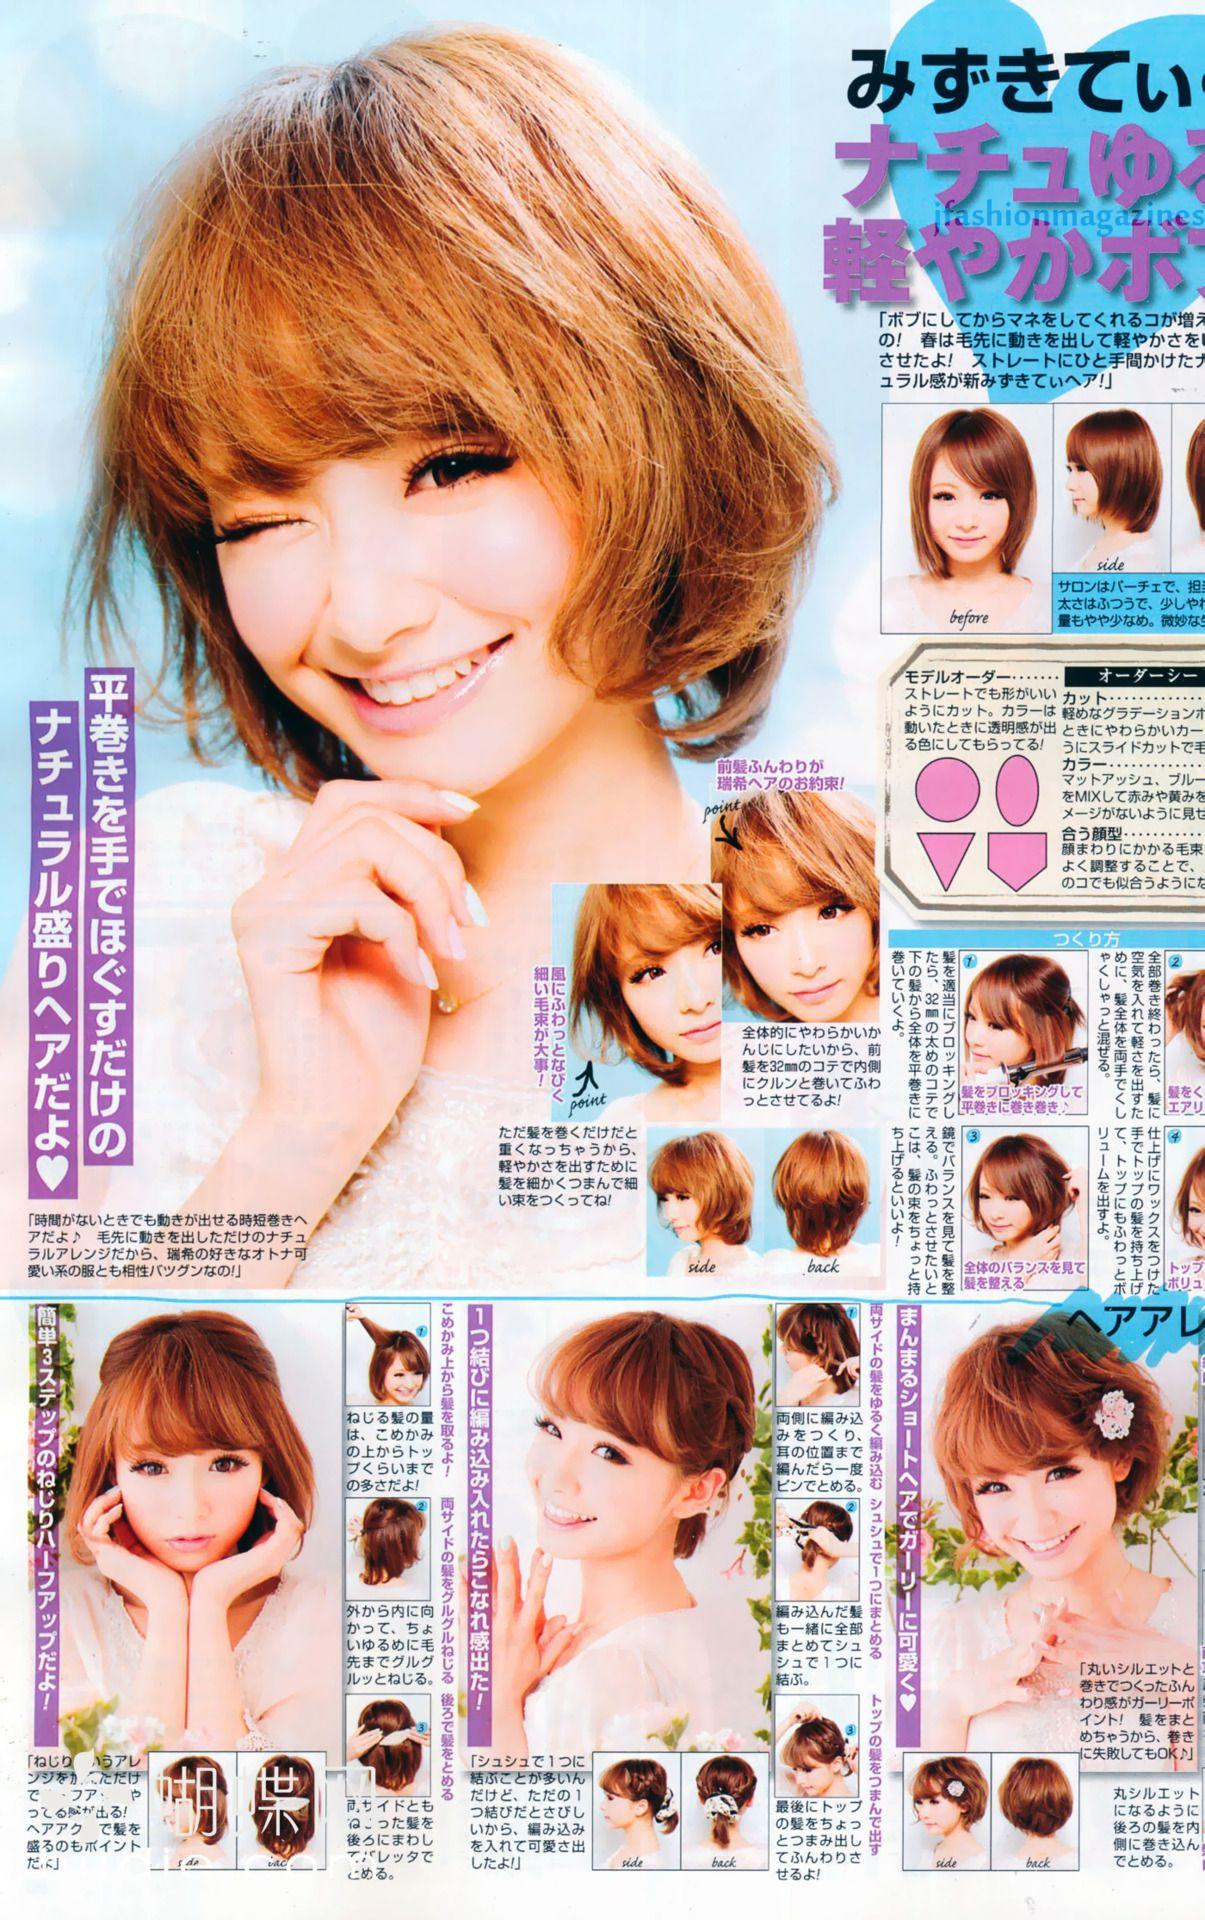 Japanese short hairstyle - Popteen   Gyaru hair, Kawaii hair tutorial,  Japanese hairstyle